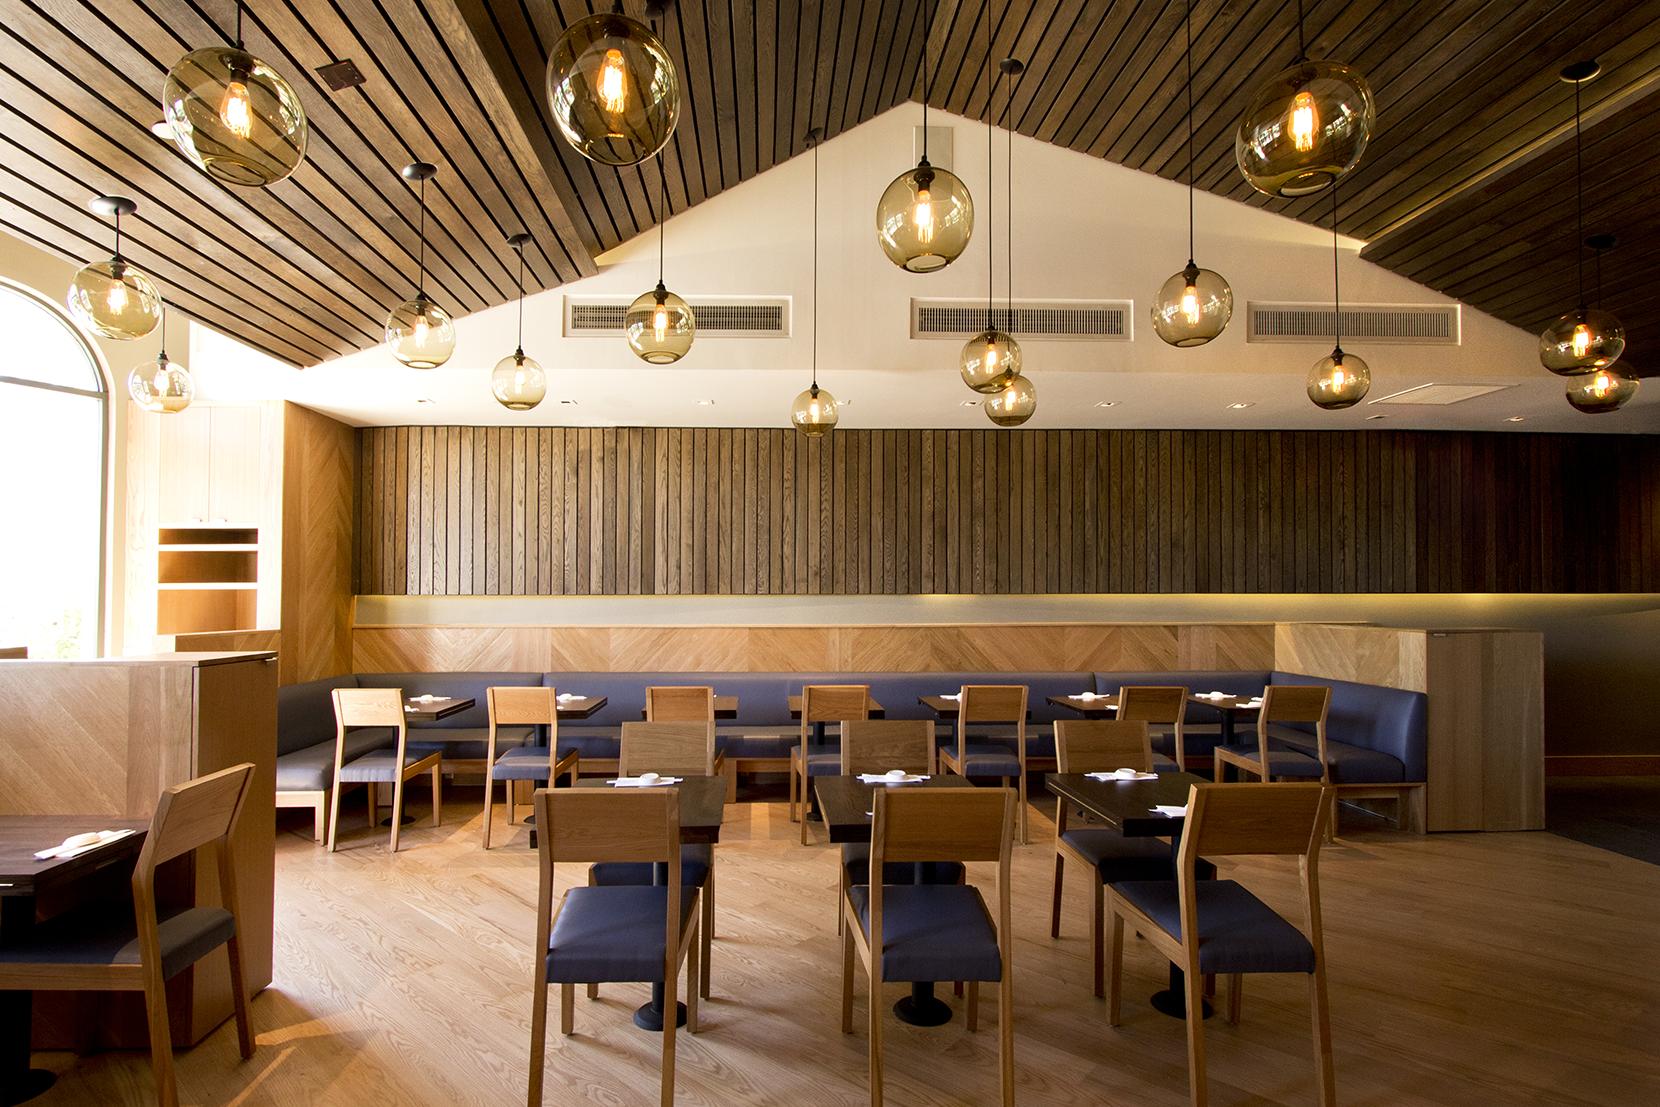 Lighting-Project-Pages_0009s_0006_Modern-Multi-Pendant-Restaurant-Pendant-Lights.png